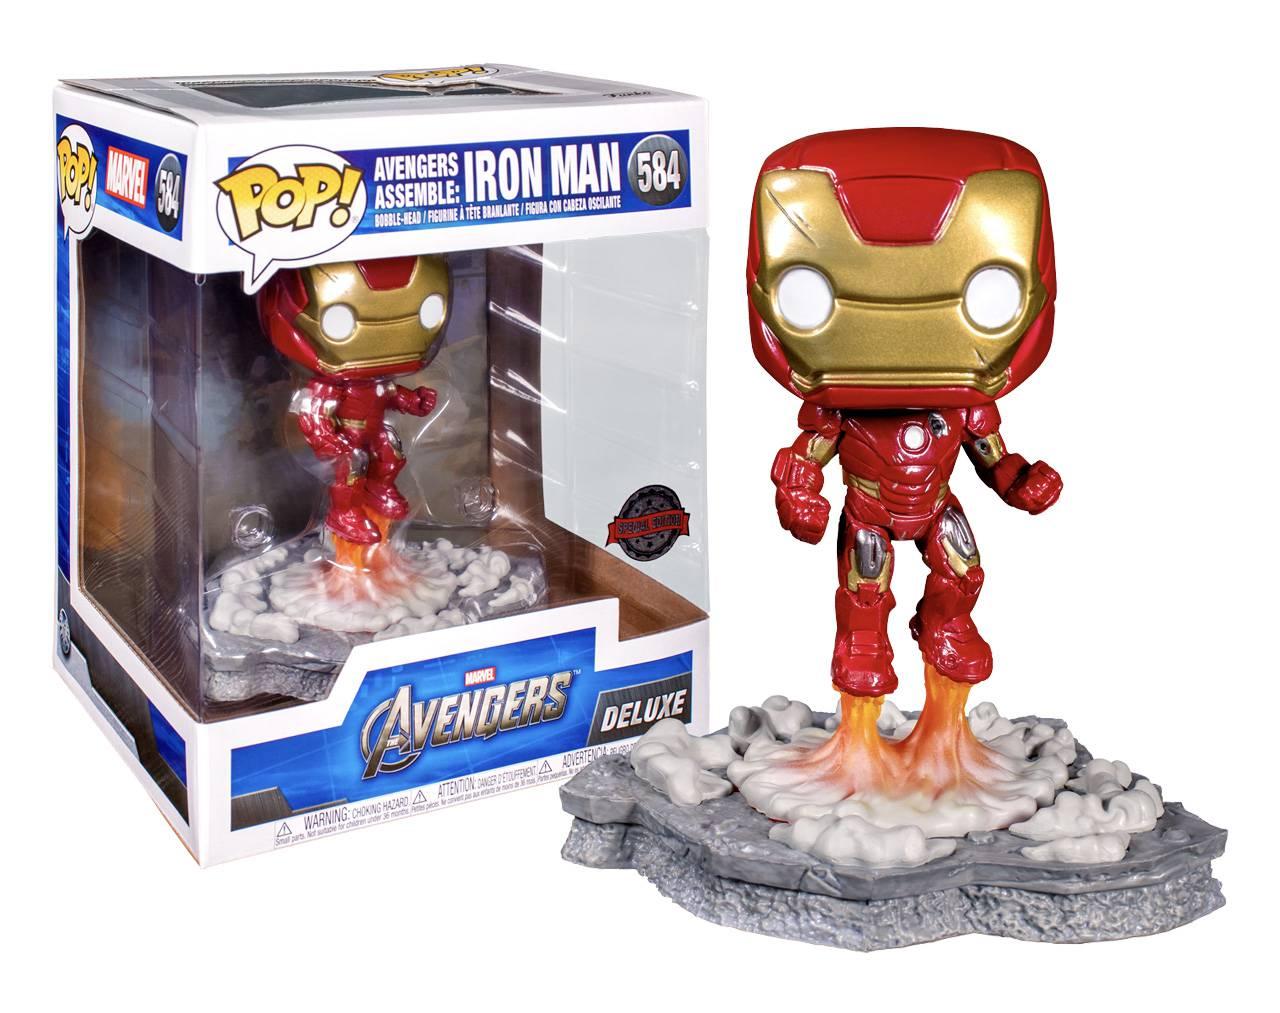 Iron Man (Avengers Assemble) Pop! Vinyl